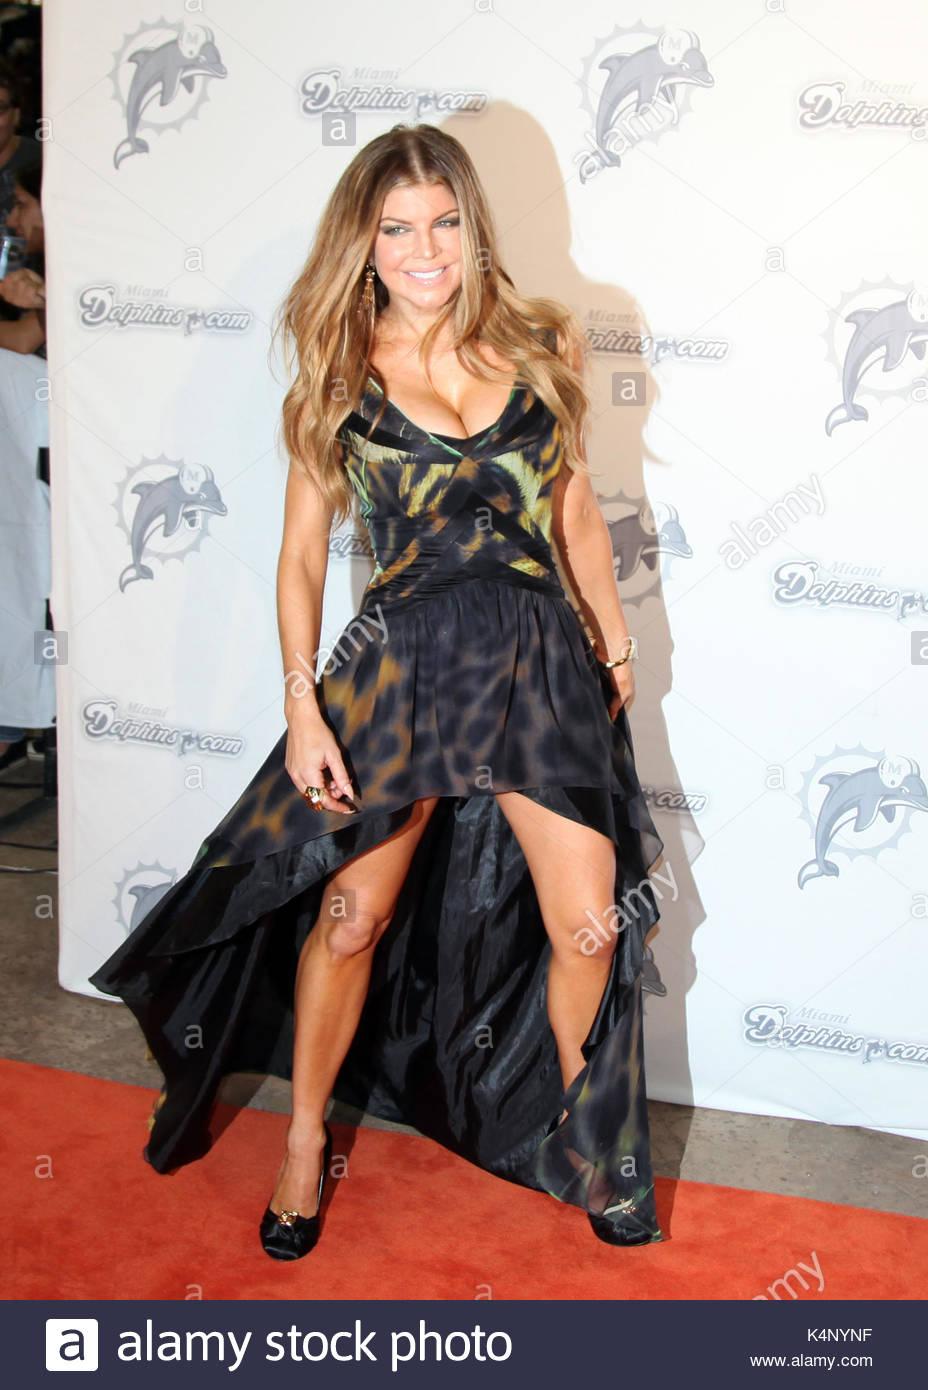 Celebrites Fergie nude photos 2019